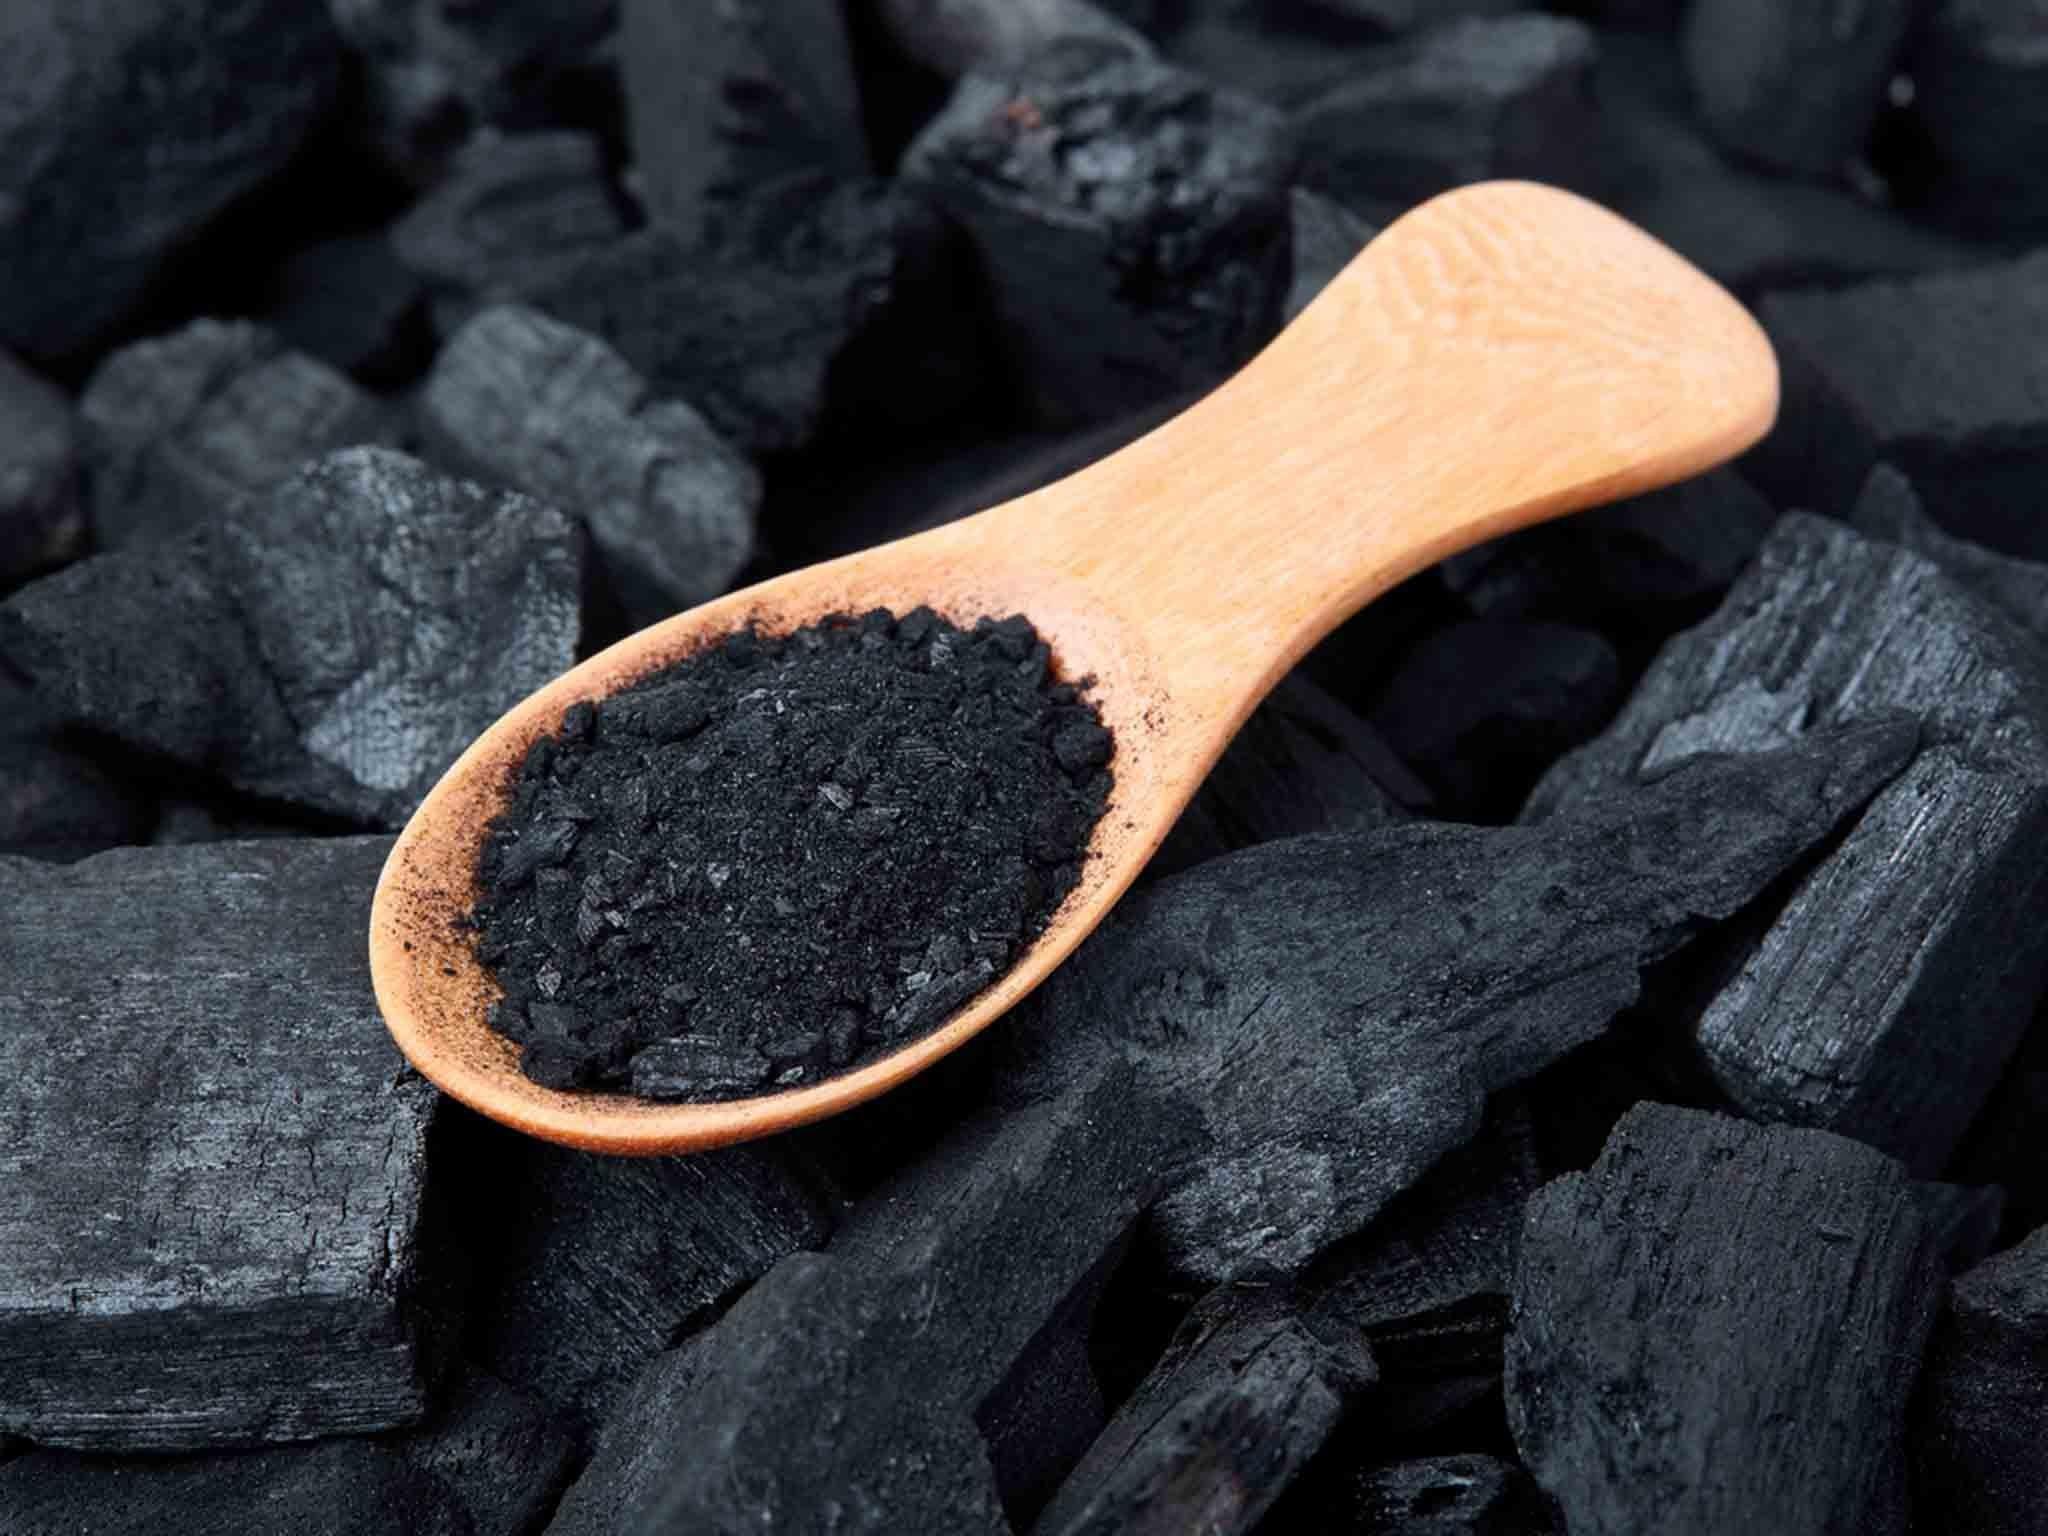 سبزه سیاه دانه Arang Aktif (actived charcoal) yang Bisa Memutihkan Gigi - seichi